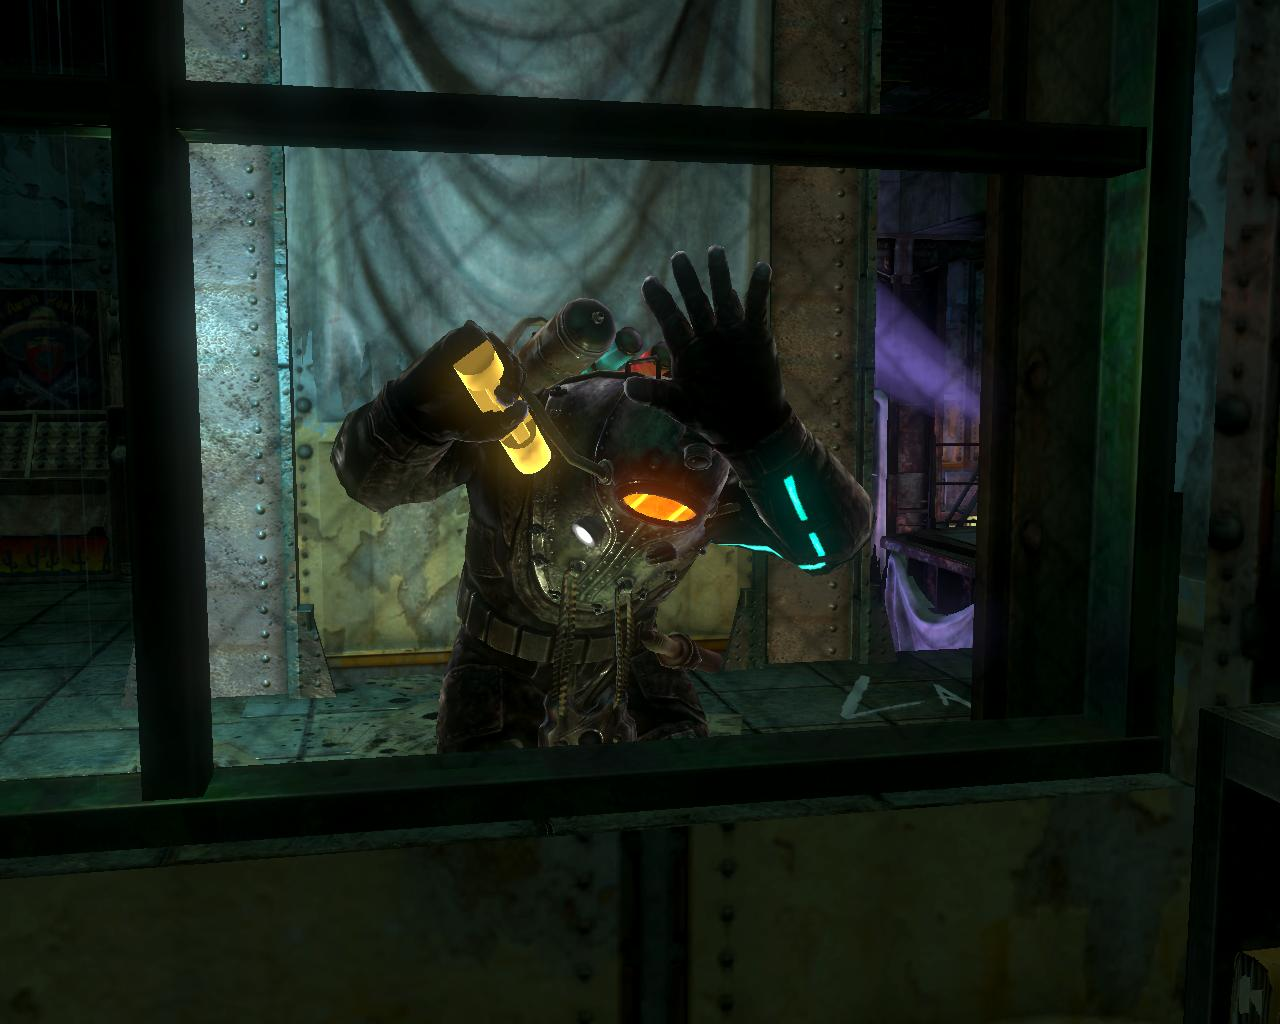 BioShock 2-Inner Persephone - Augustus Sinclair as Subject Omega f0354Bioshock 2 Eleanor And Delta